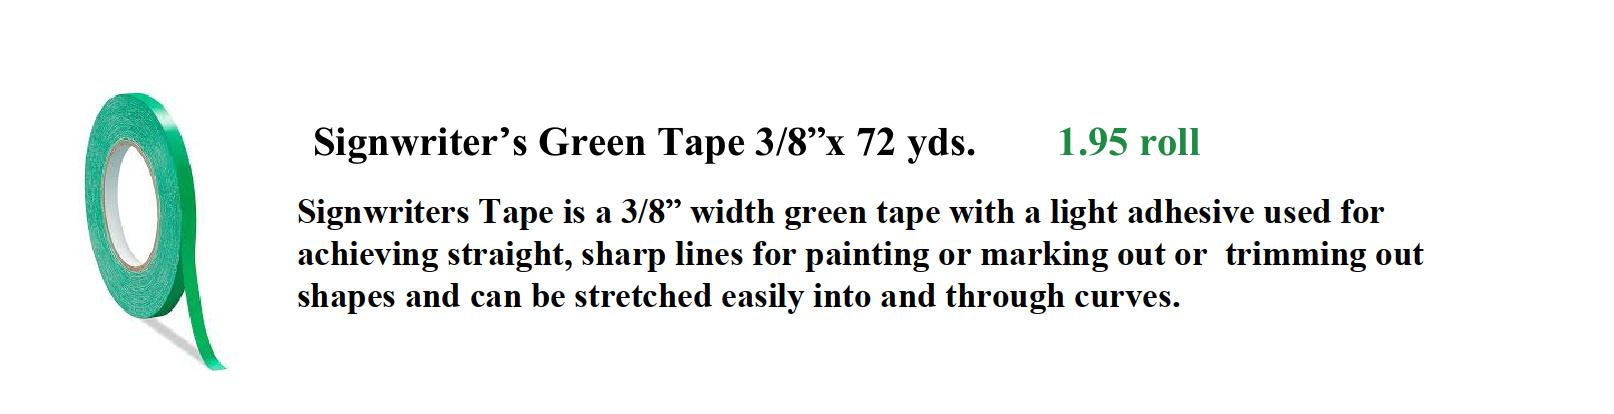 Tape signwriters image - Pinstriping Tape